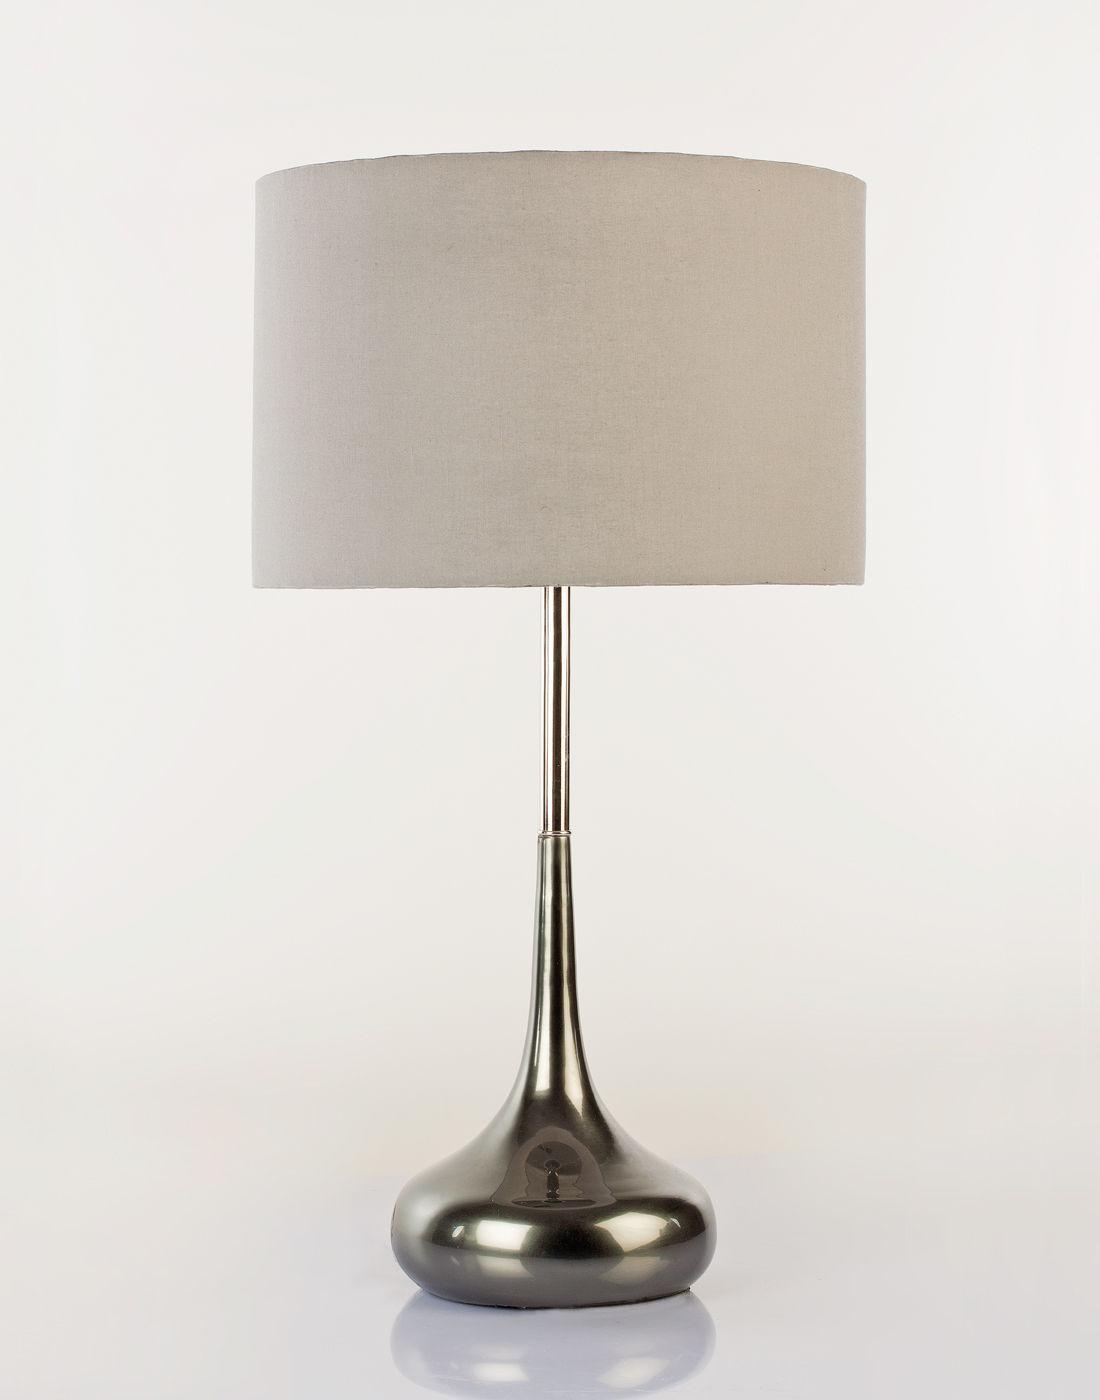 led table lighting. Baltic (LED) Table Lamp Led Lighting